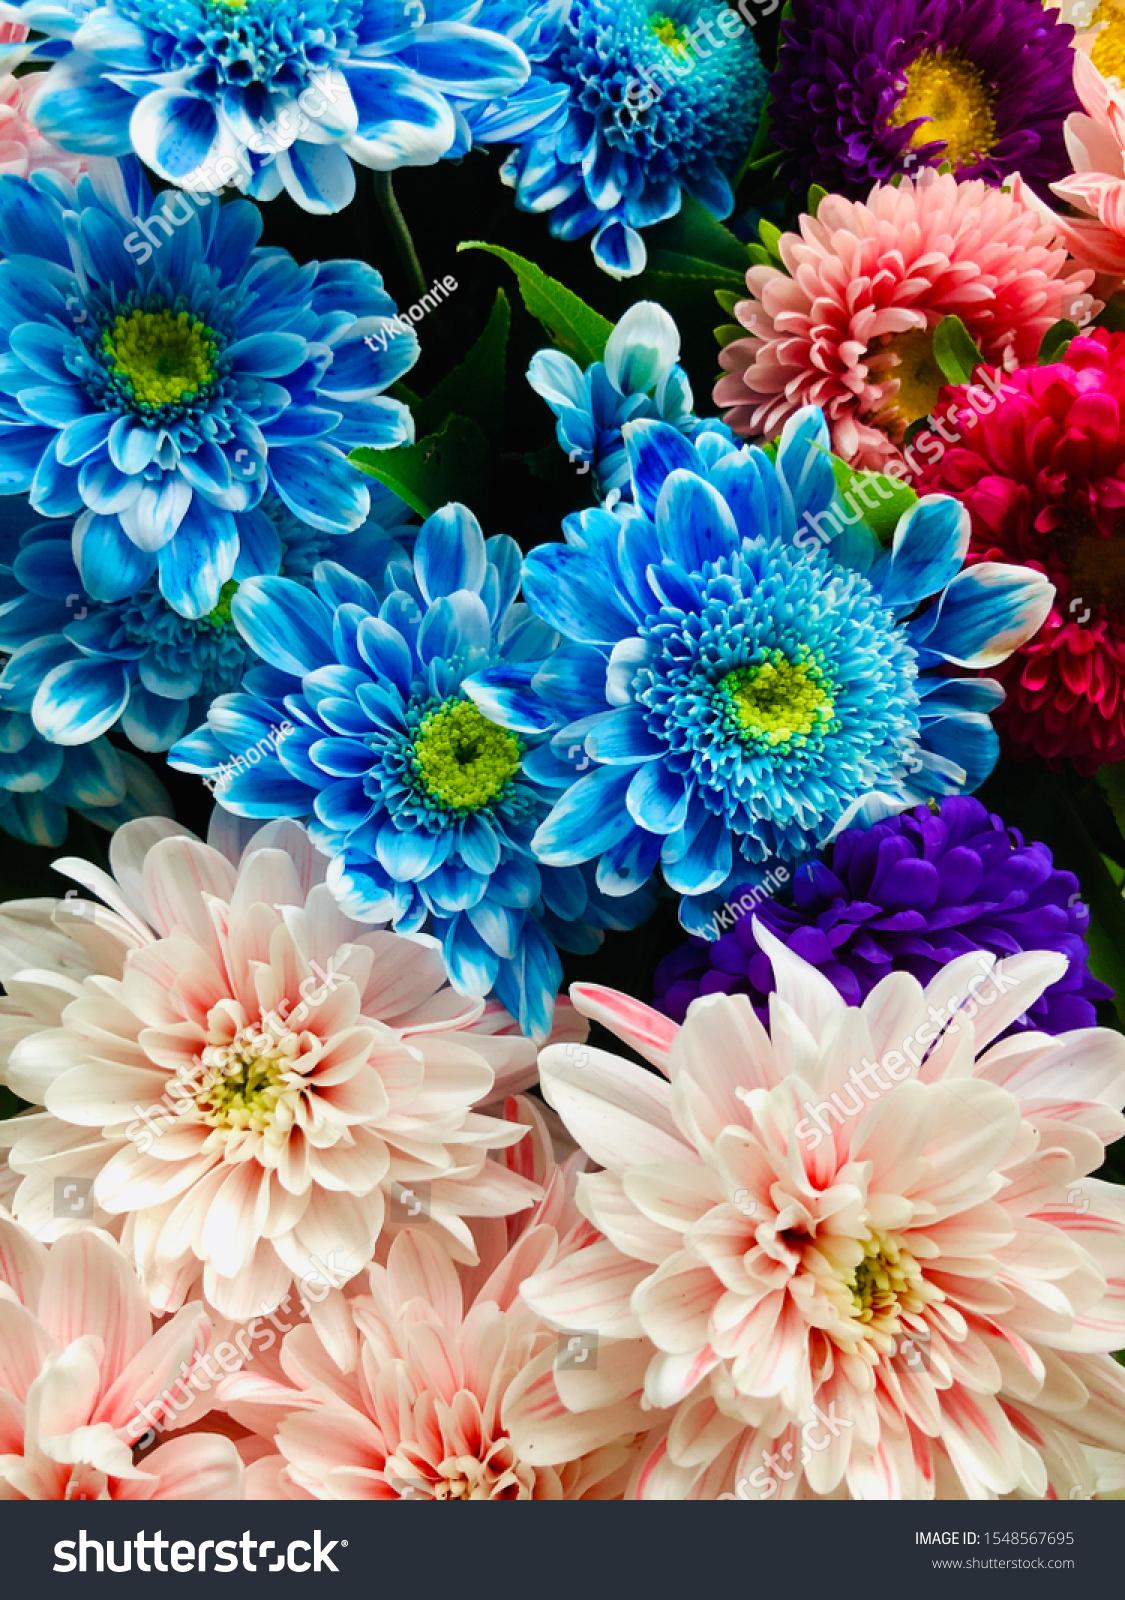 stock-photo-chrysanthemum-and-aster-blue